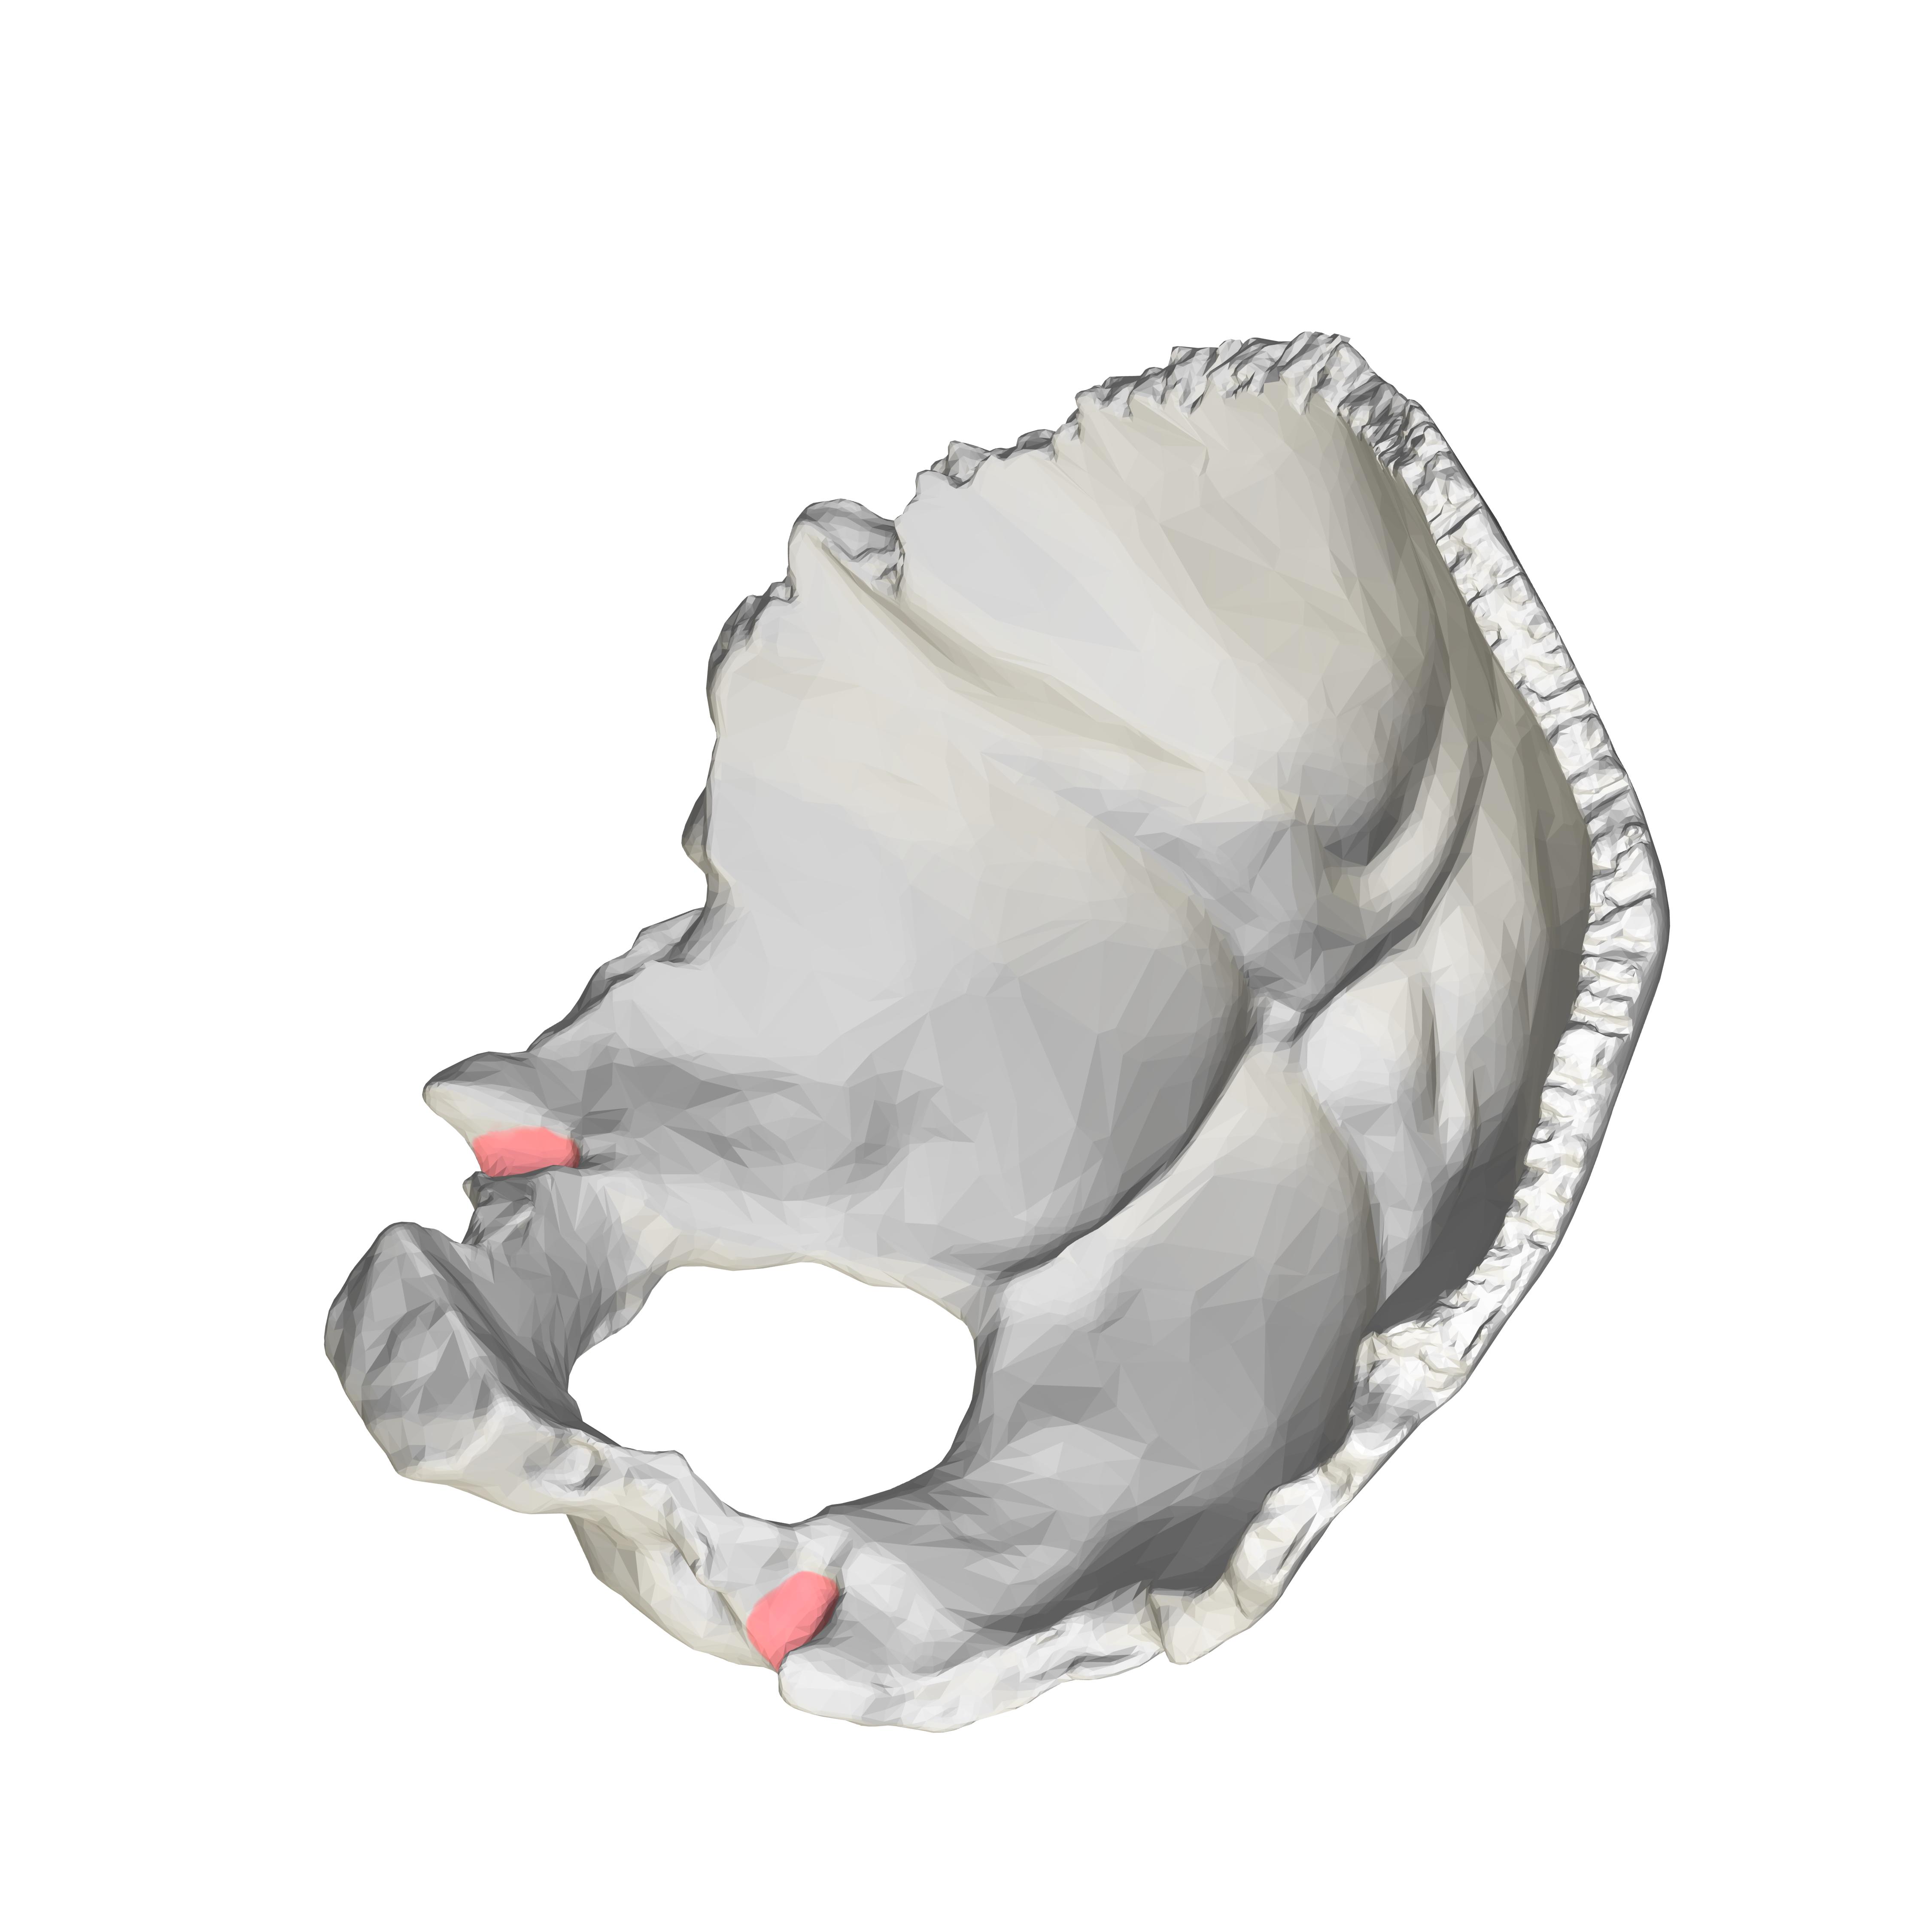 Jugular Notch Occipital Bone